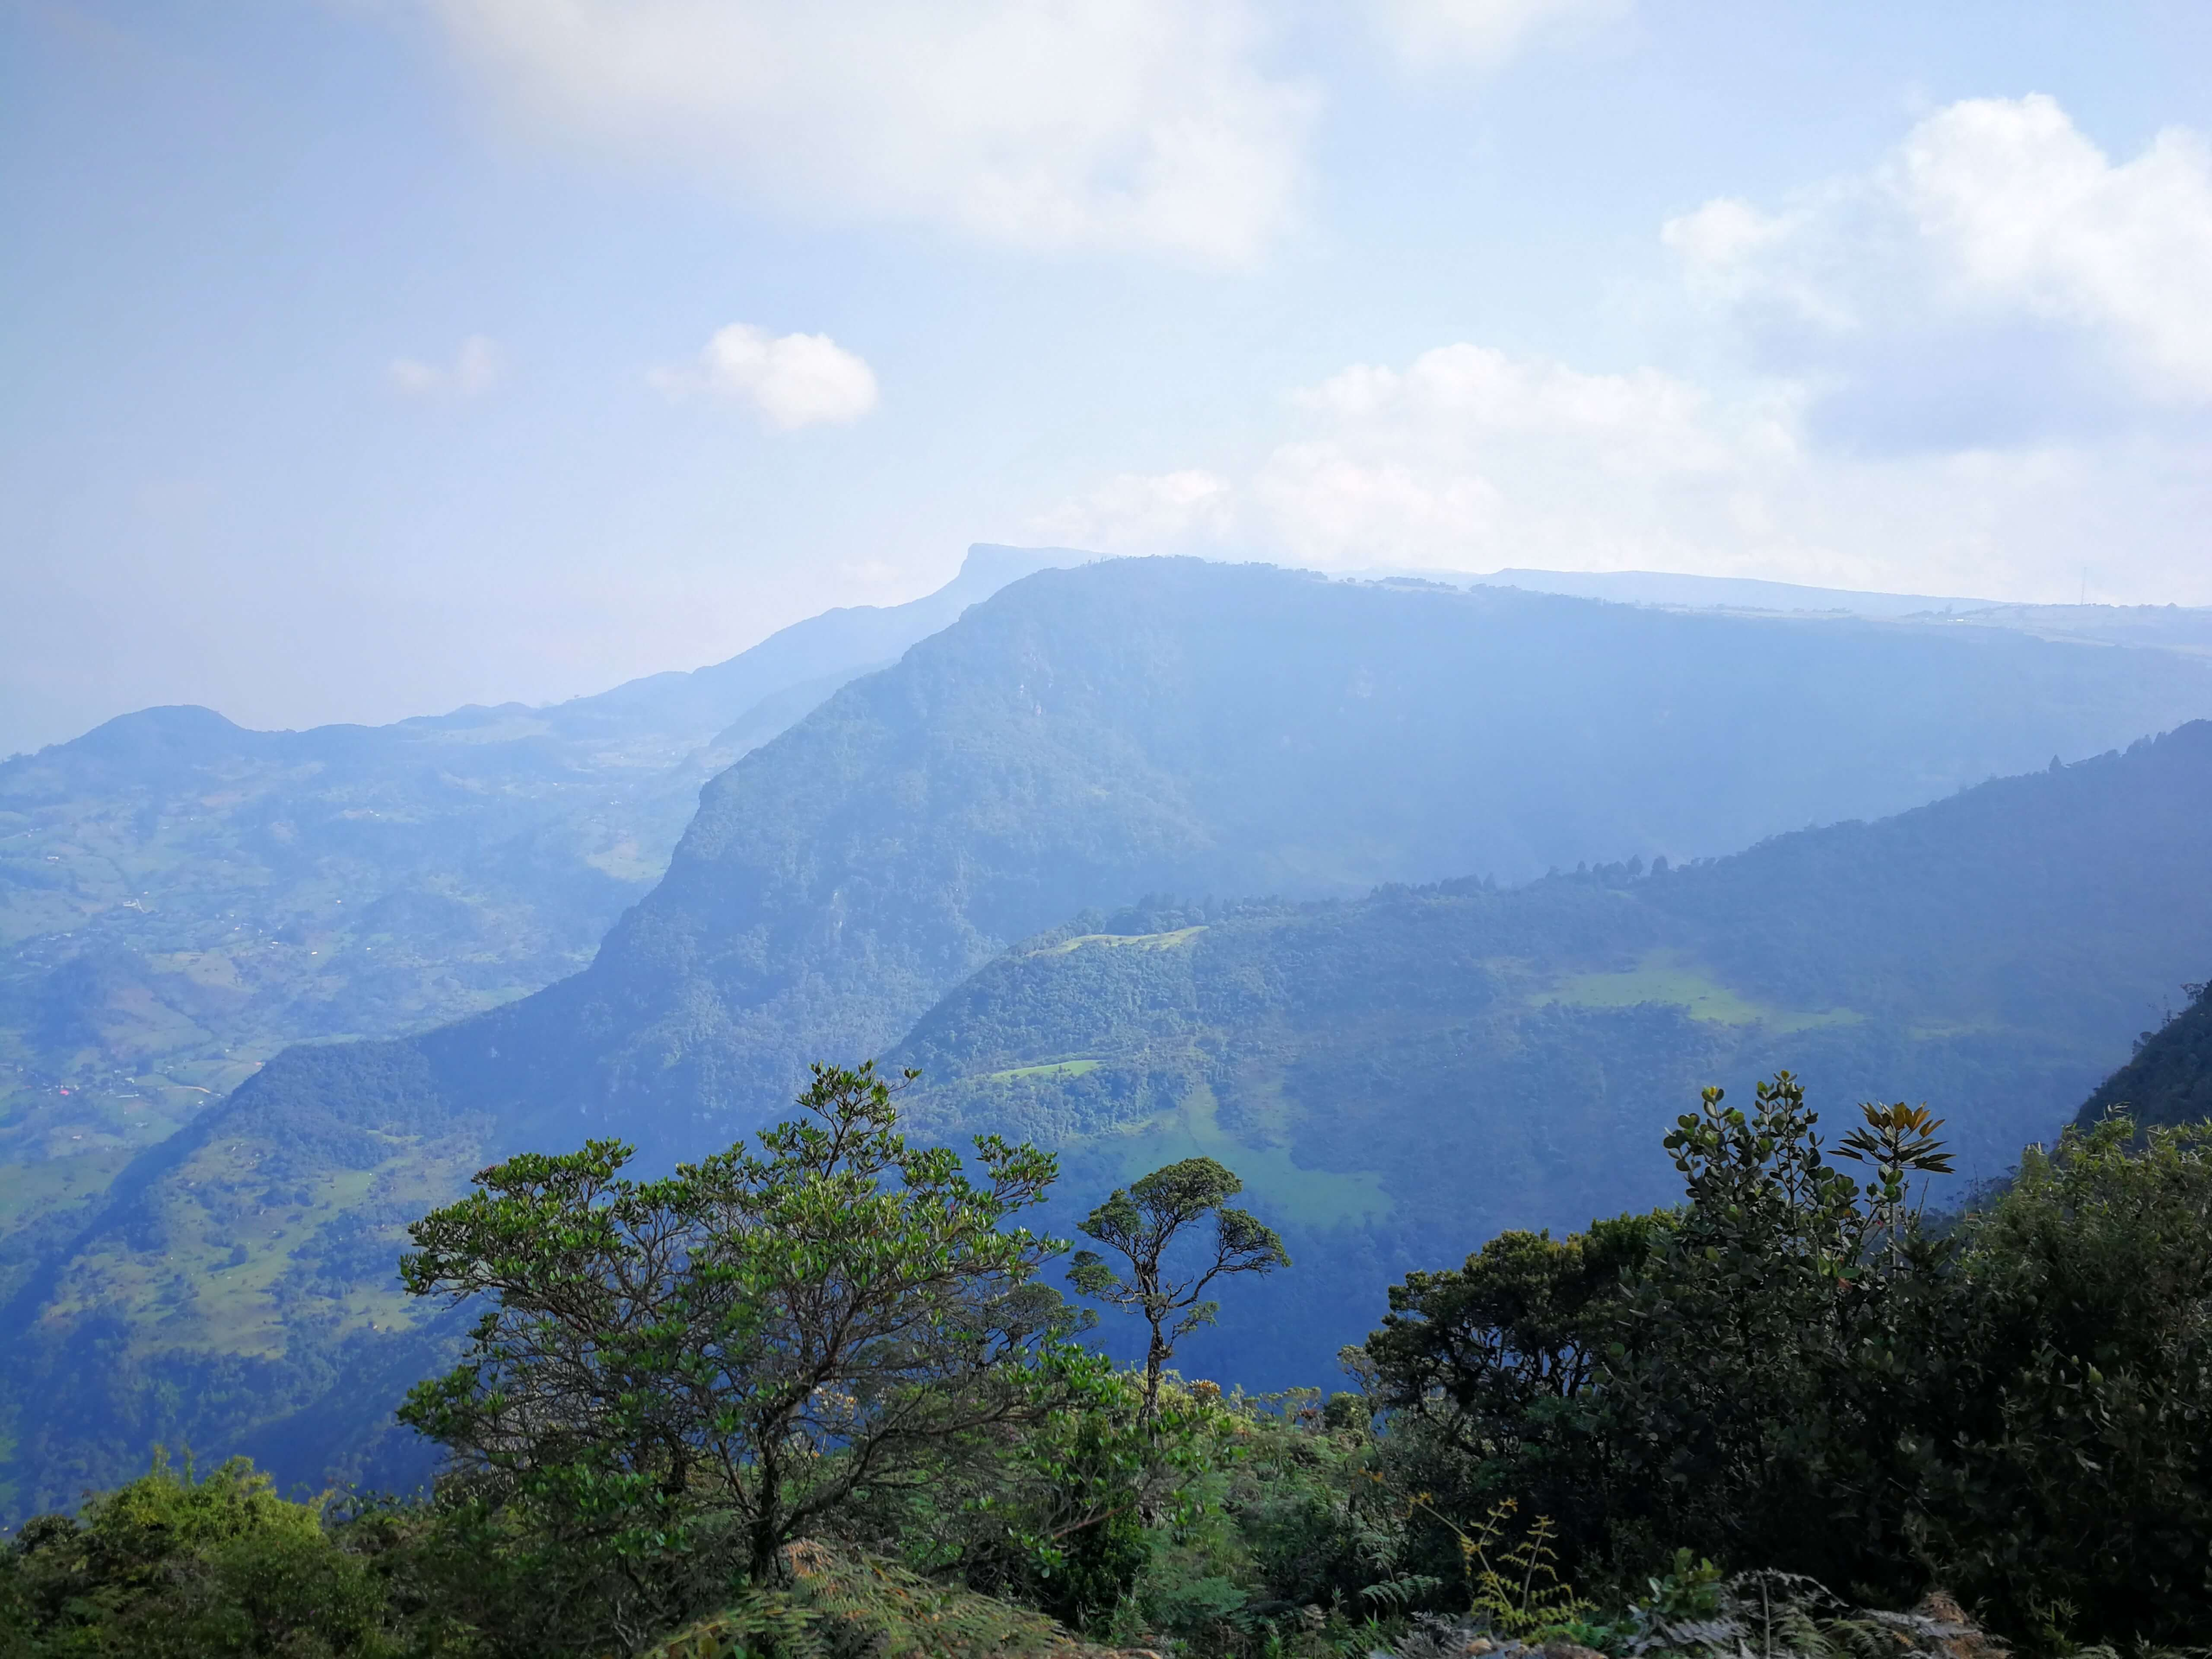 choachi vyhled z chorrery hory